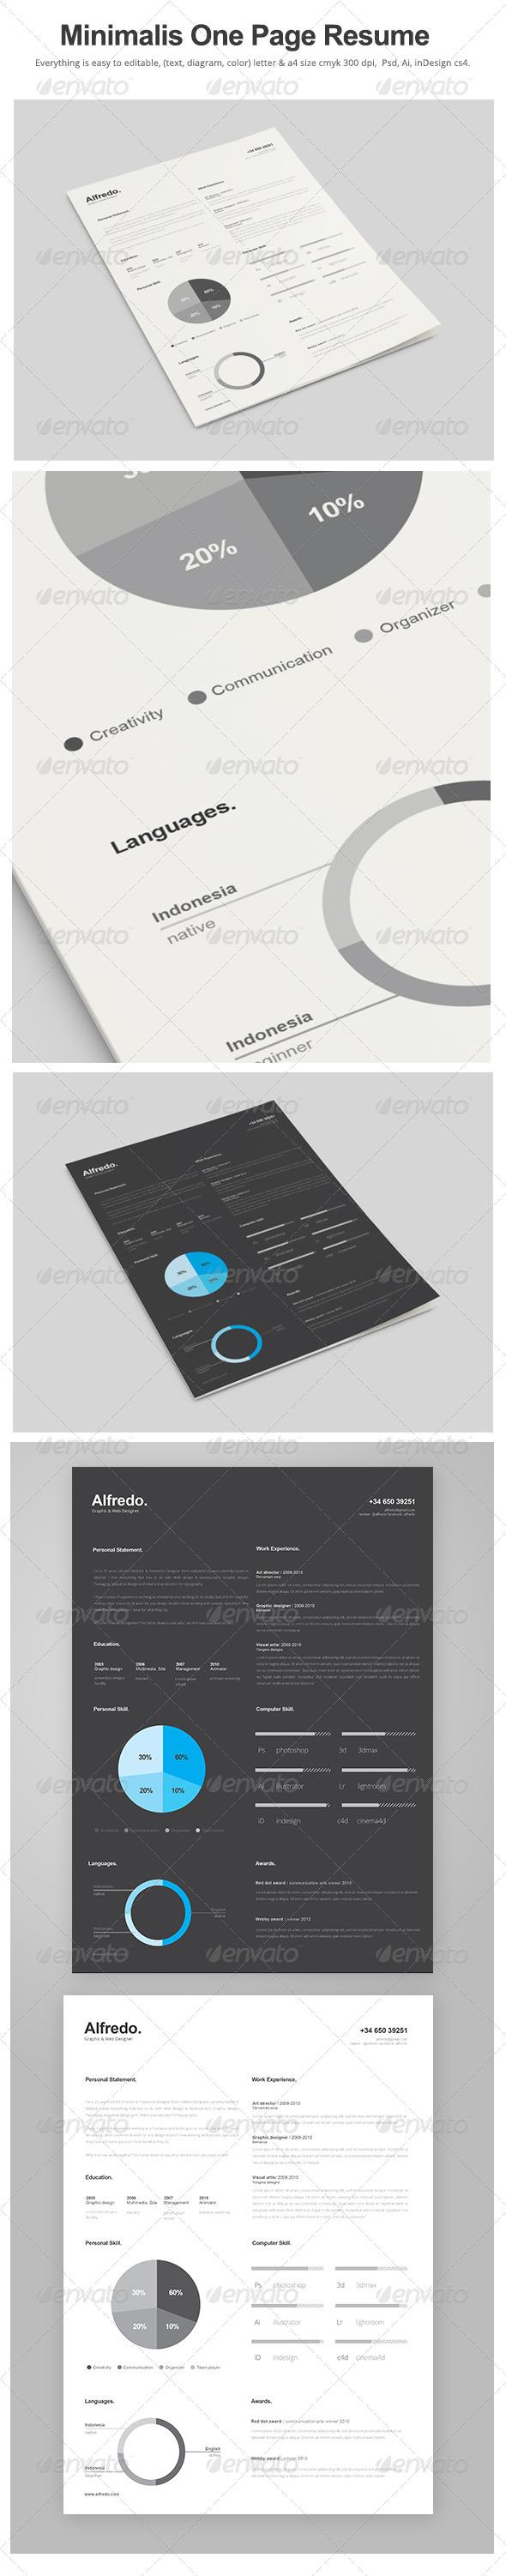 Minimalist Resume Graphics, Designs & Templates